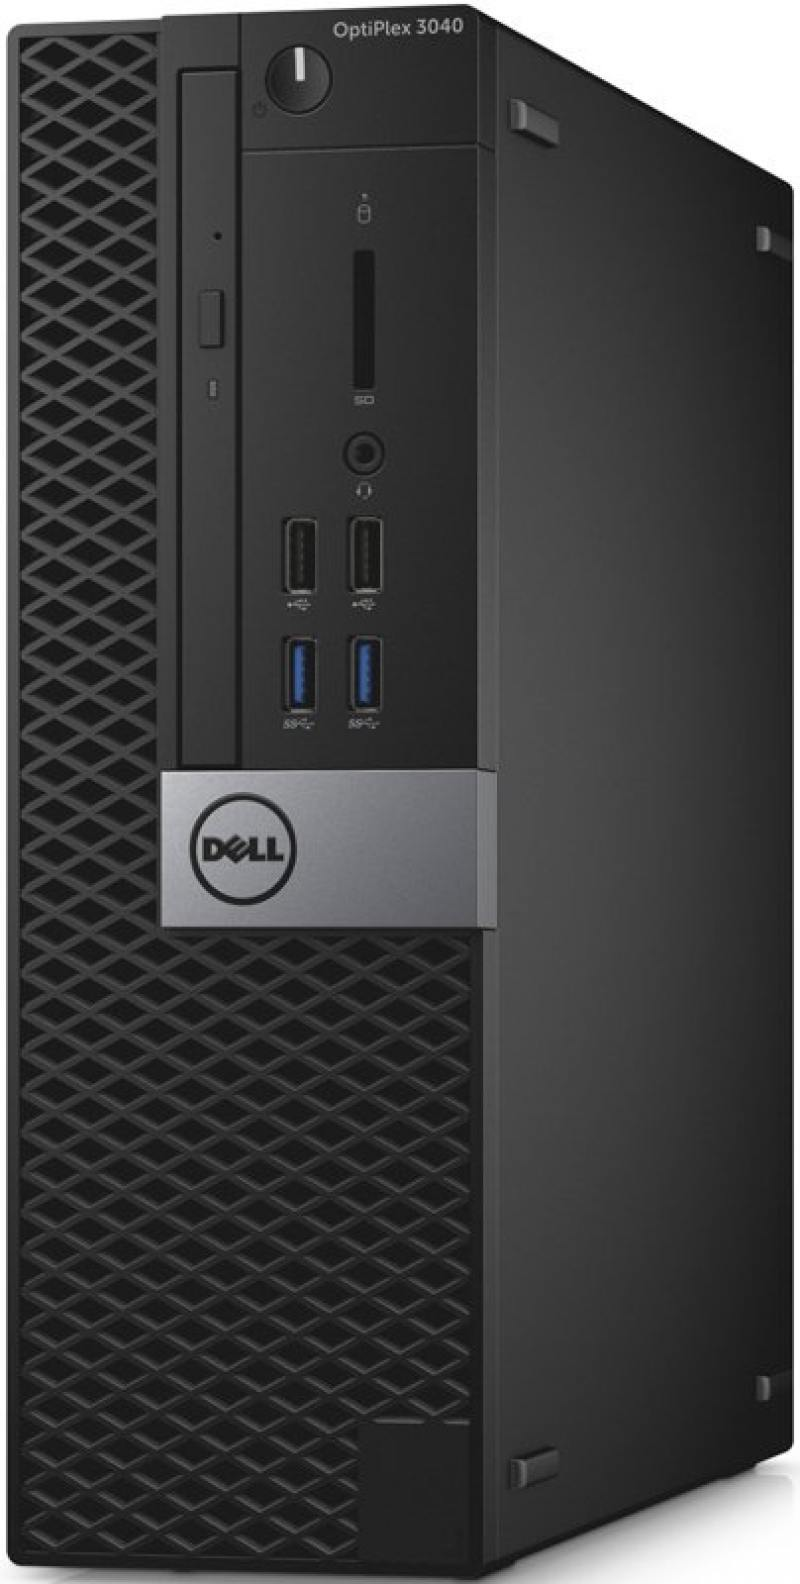 Системный блок DELL Optiplex 3040 SFF i3-6100 3.7GHz 4Gb 128Gb SSD HD530 DVD-RW Linux клавиатура мыш